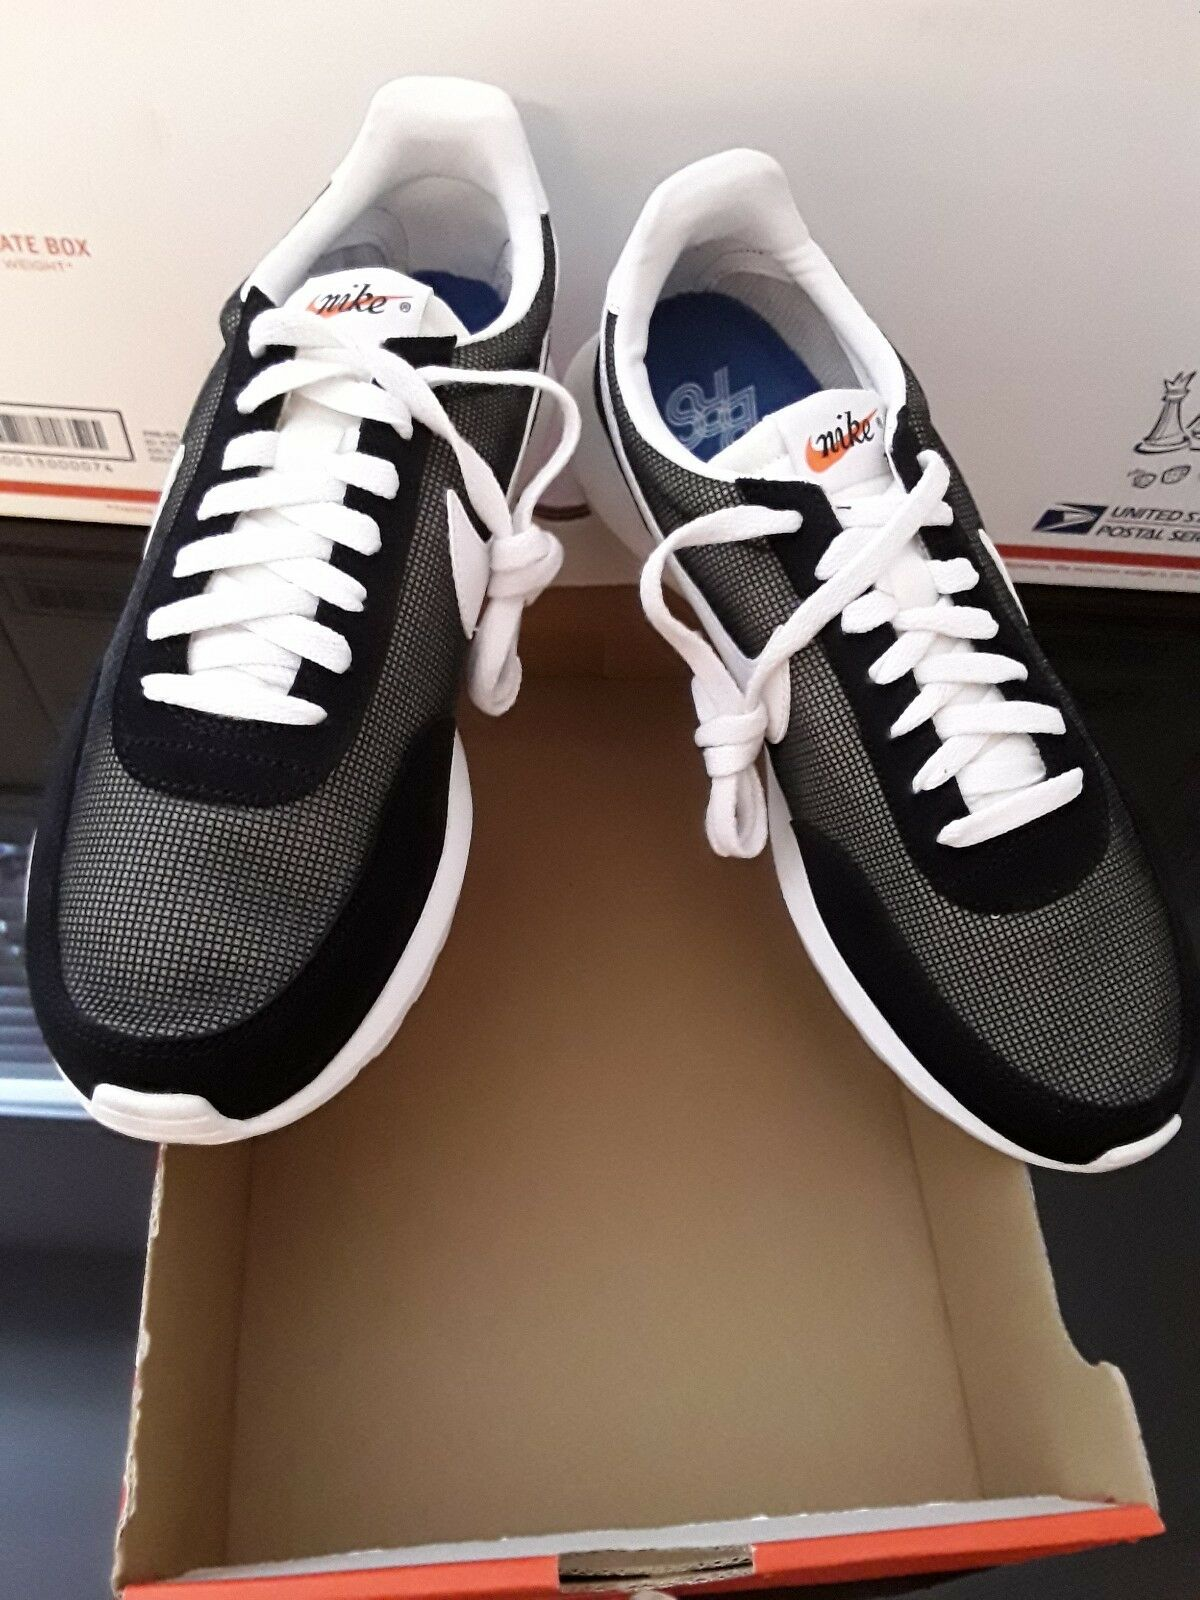 Nike 001 roshe dbreak nm scarpe 826666 001 Nike 120 uomini dimensioni 11,5 f65c62